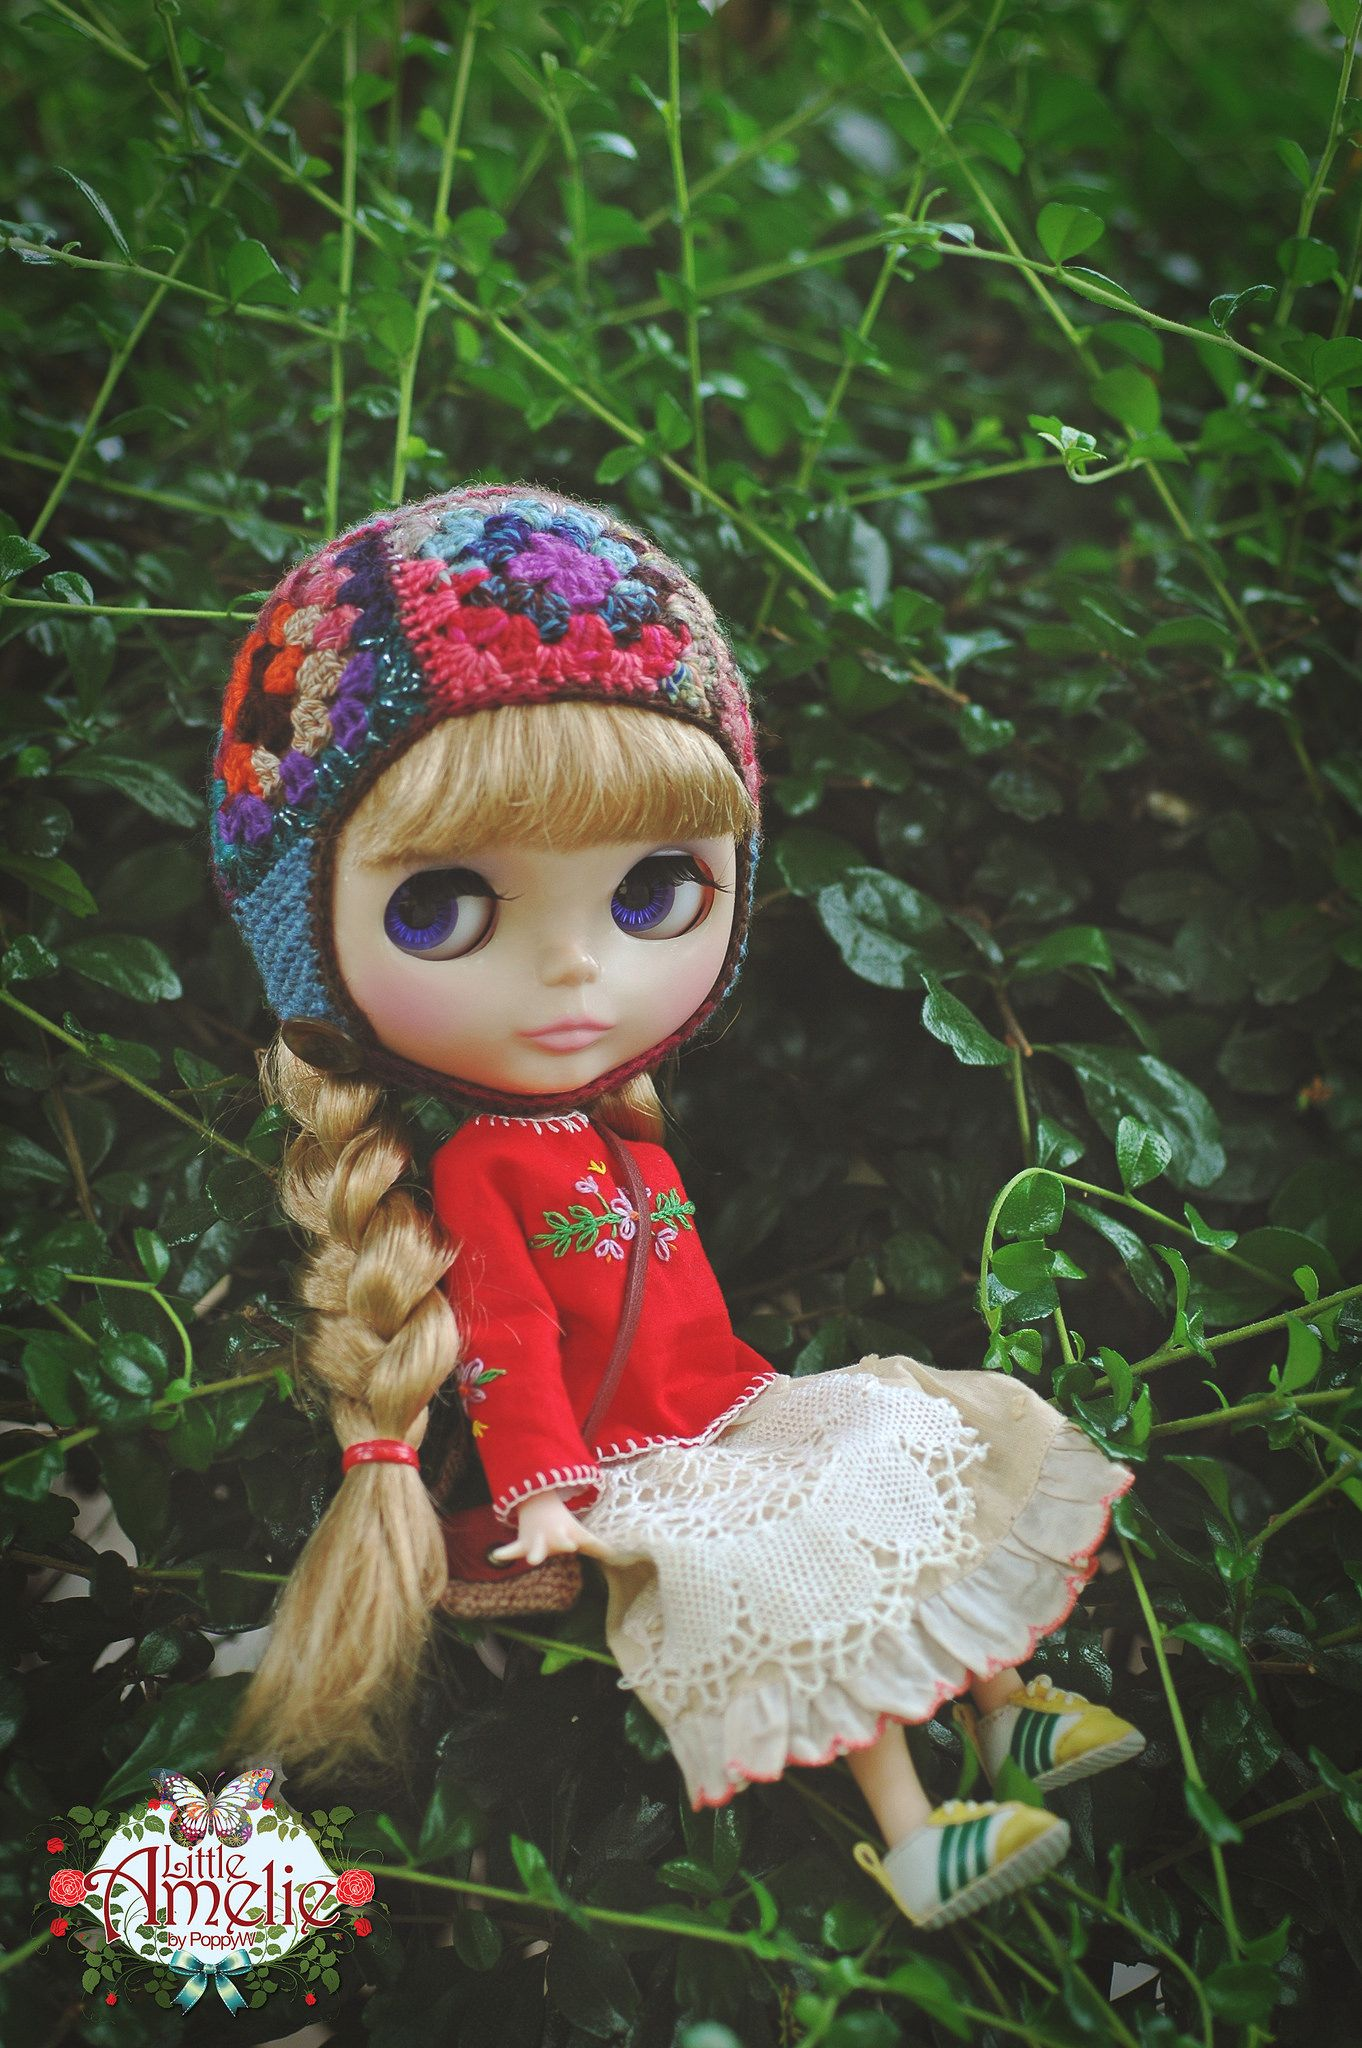 https://flic.kr/p/vSrVgg | Hello! have a nice day <3 | Model : Elli-rose Outfits : Helmet -Megipupu, Blouse - LittleAmelie, Skirt - I Have Wings